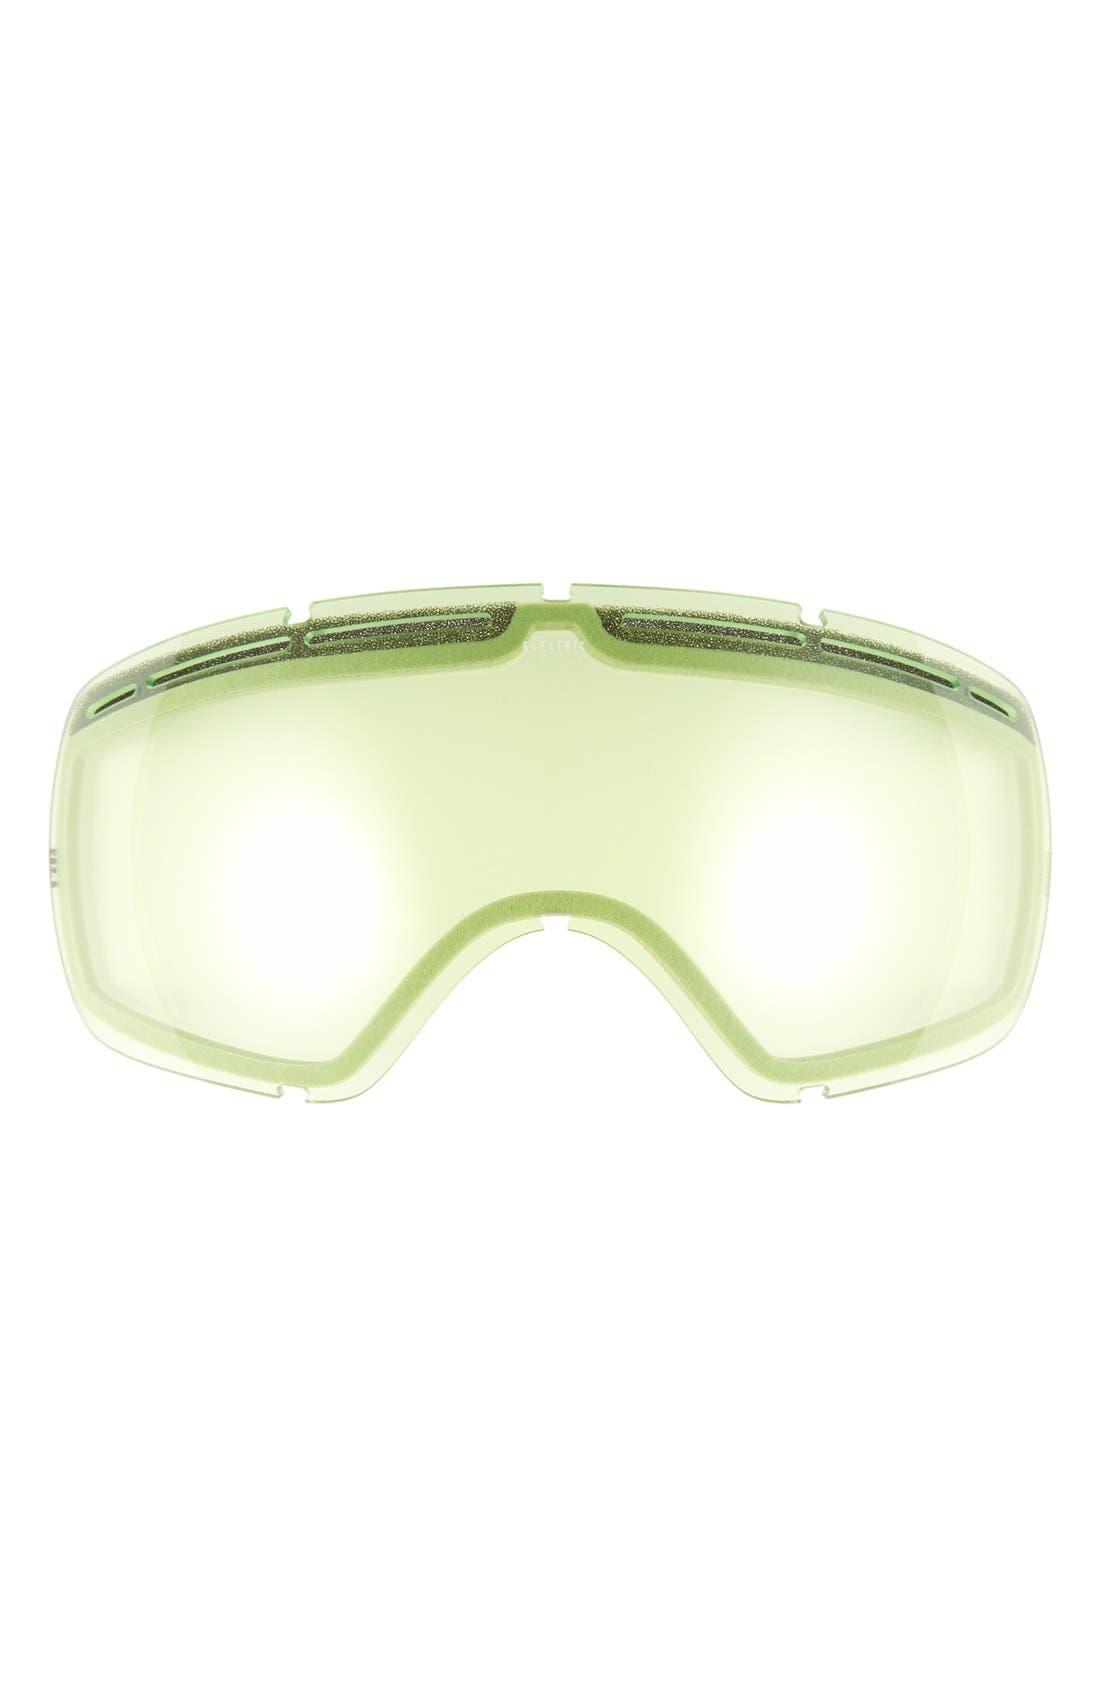 EG 2.5 215mm Snow Goggles,                             Alternate thumbnail 23, color,